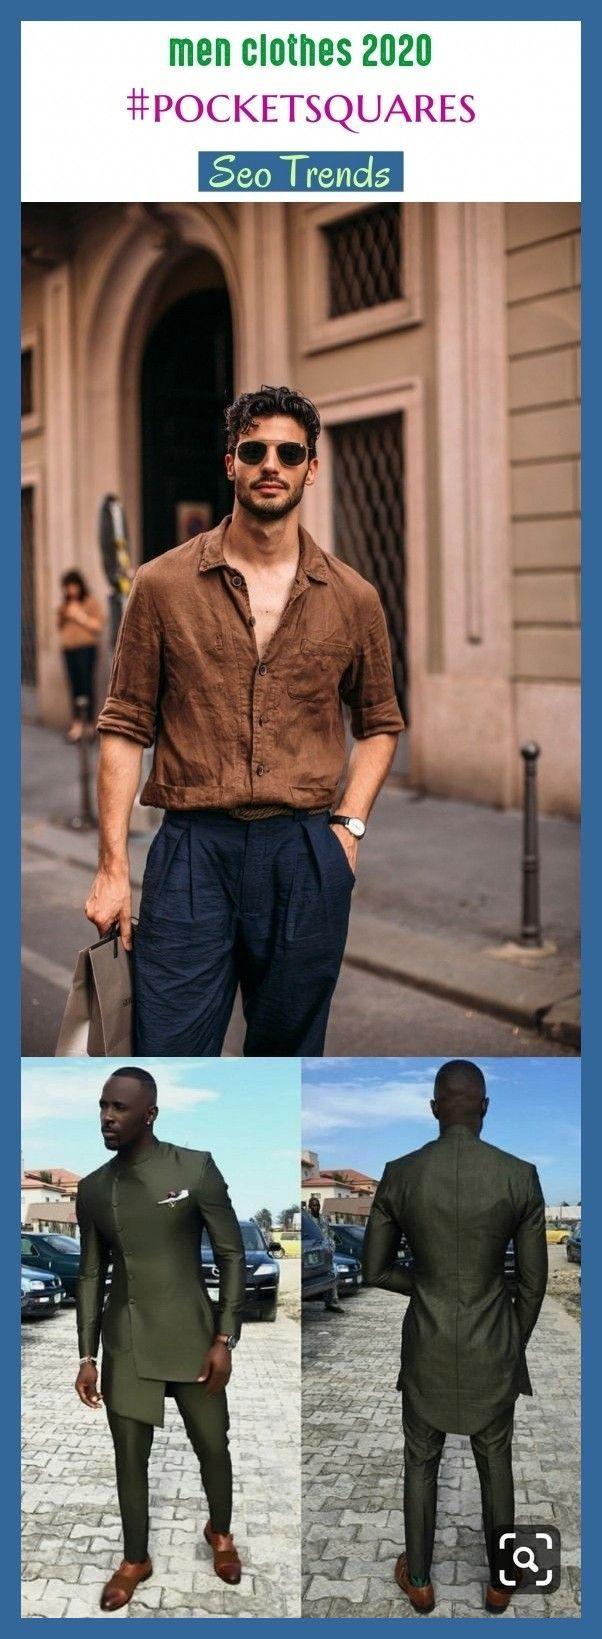 Ropa de hombre 2020 #pocketsquares #seo # seo2020 #trending. ropa de hombre casual, hombres … – #casua …